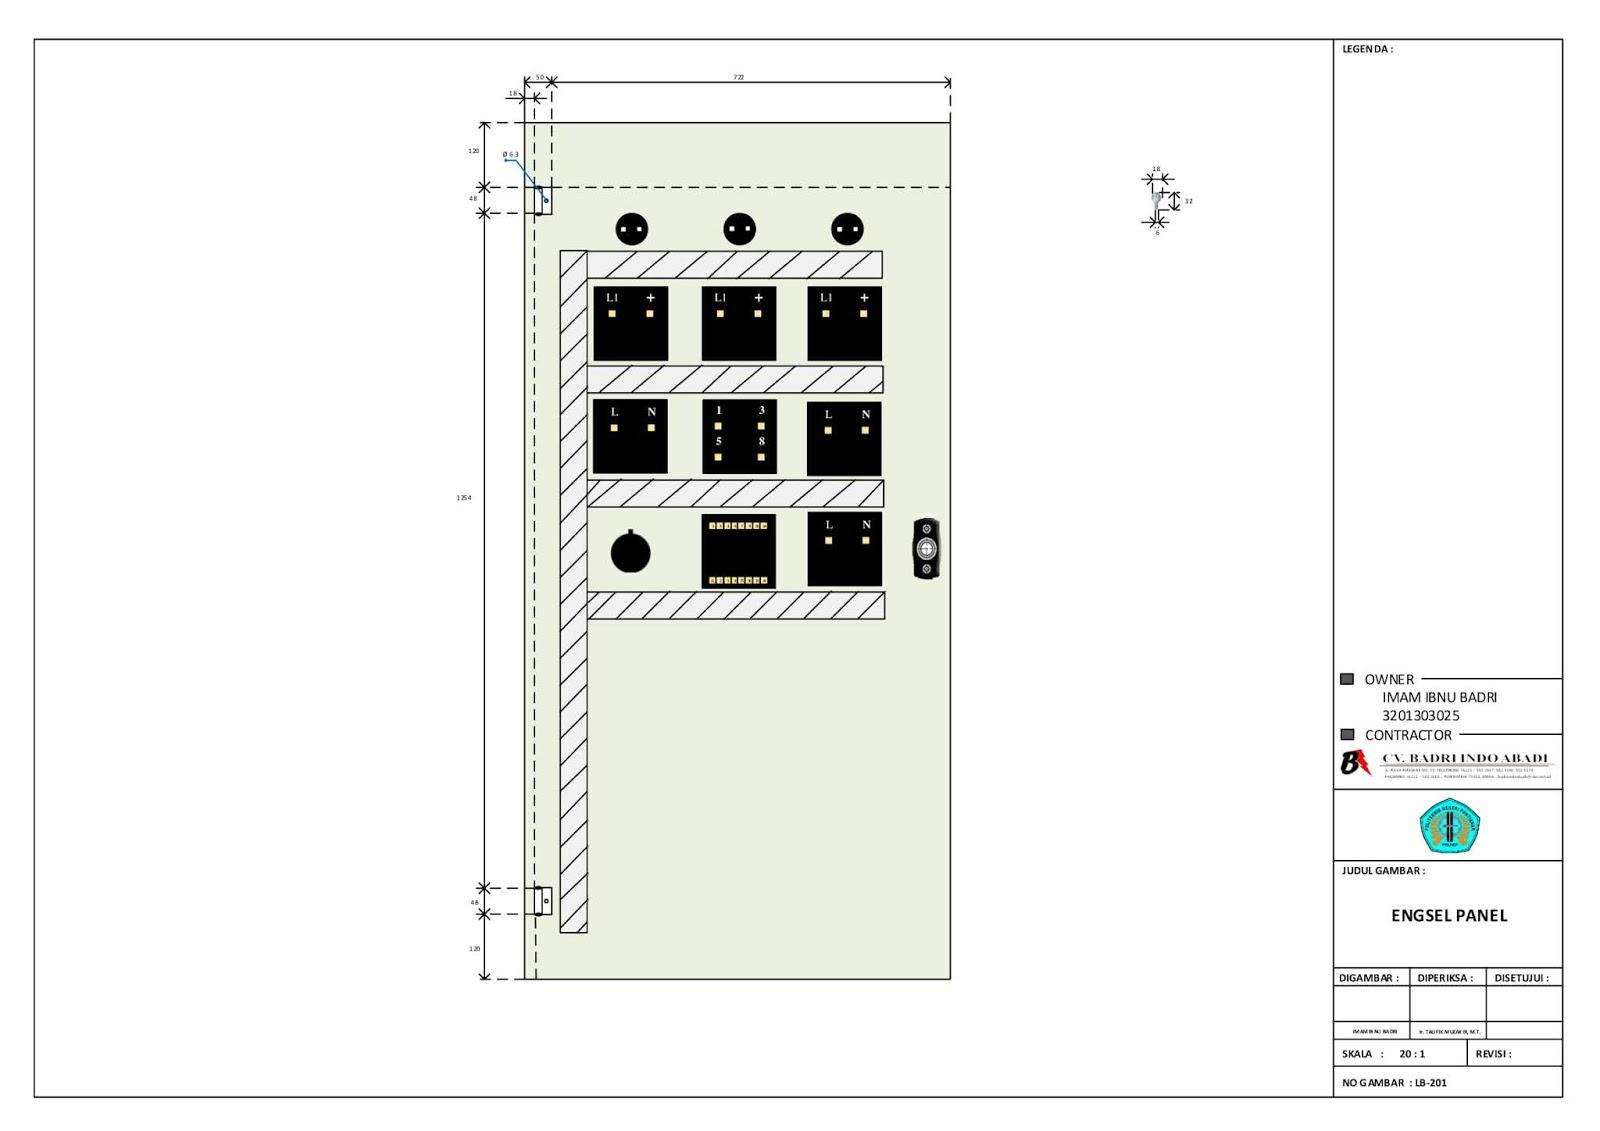 Engsel Panel